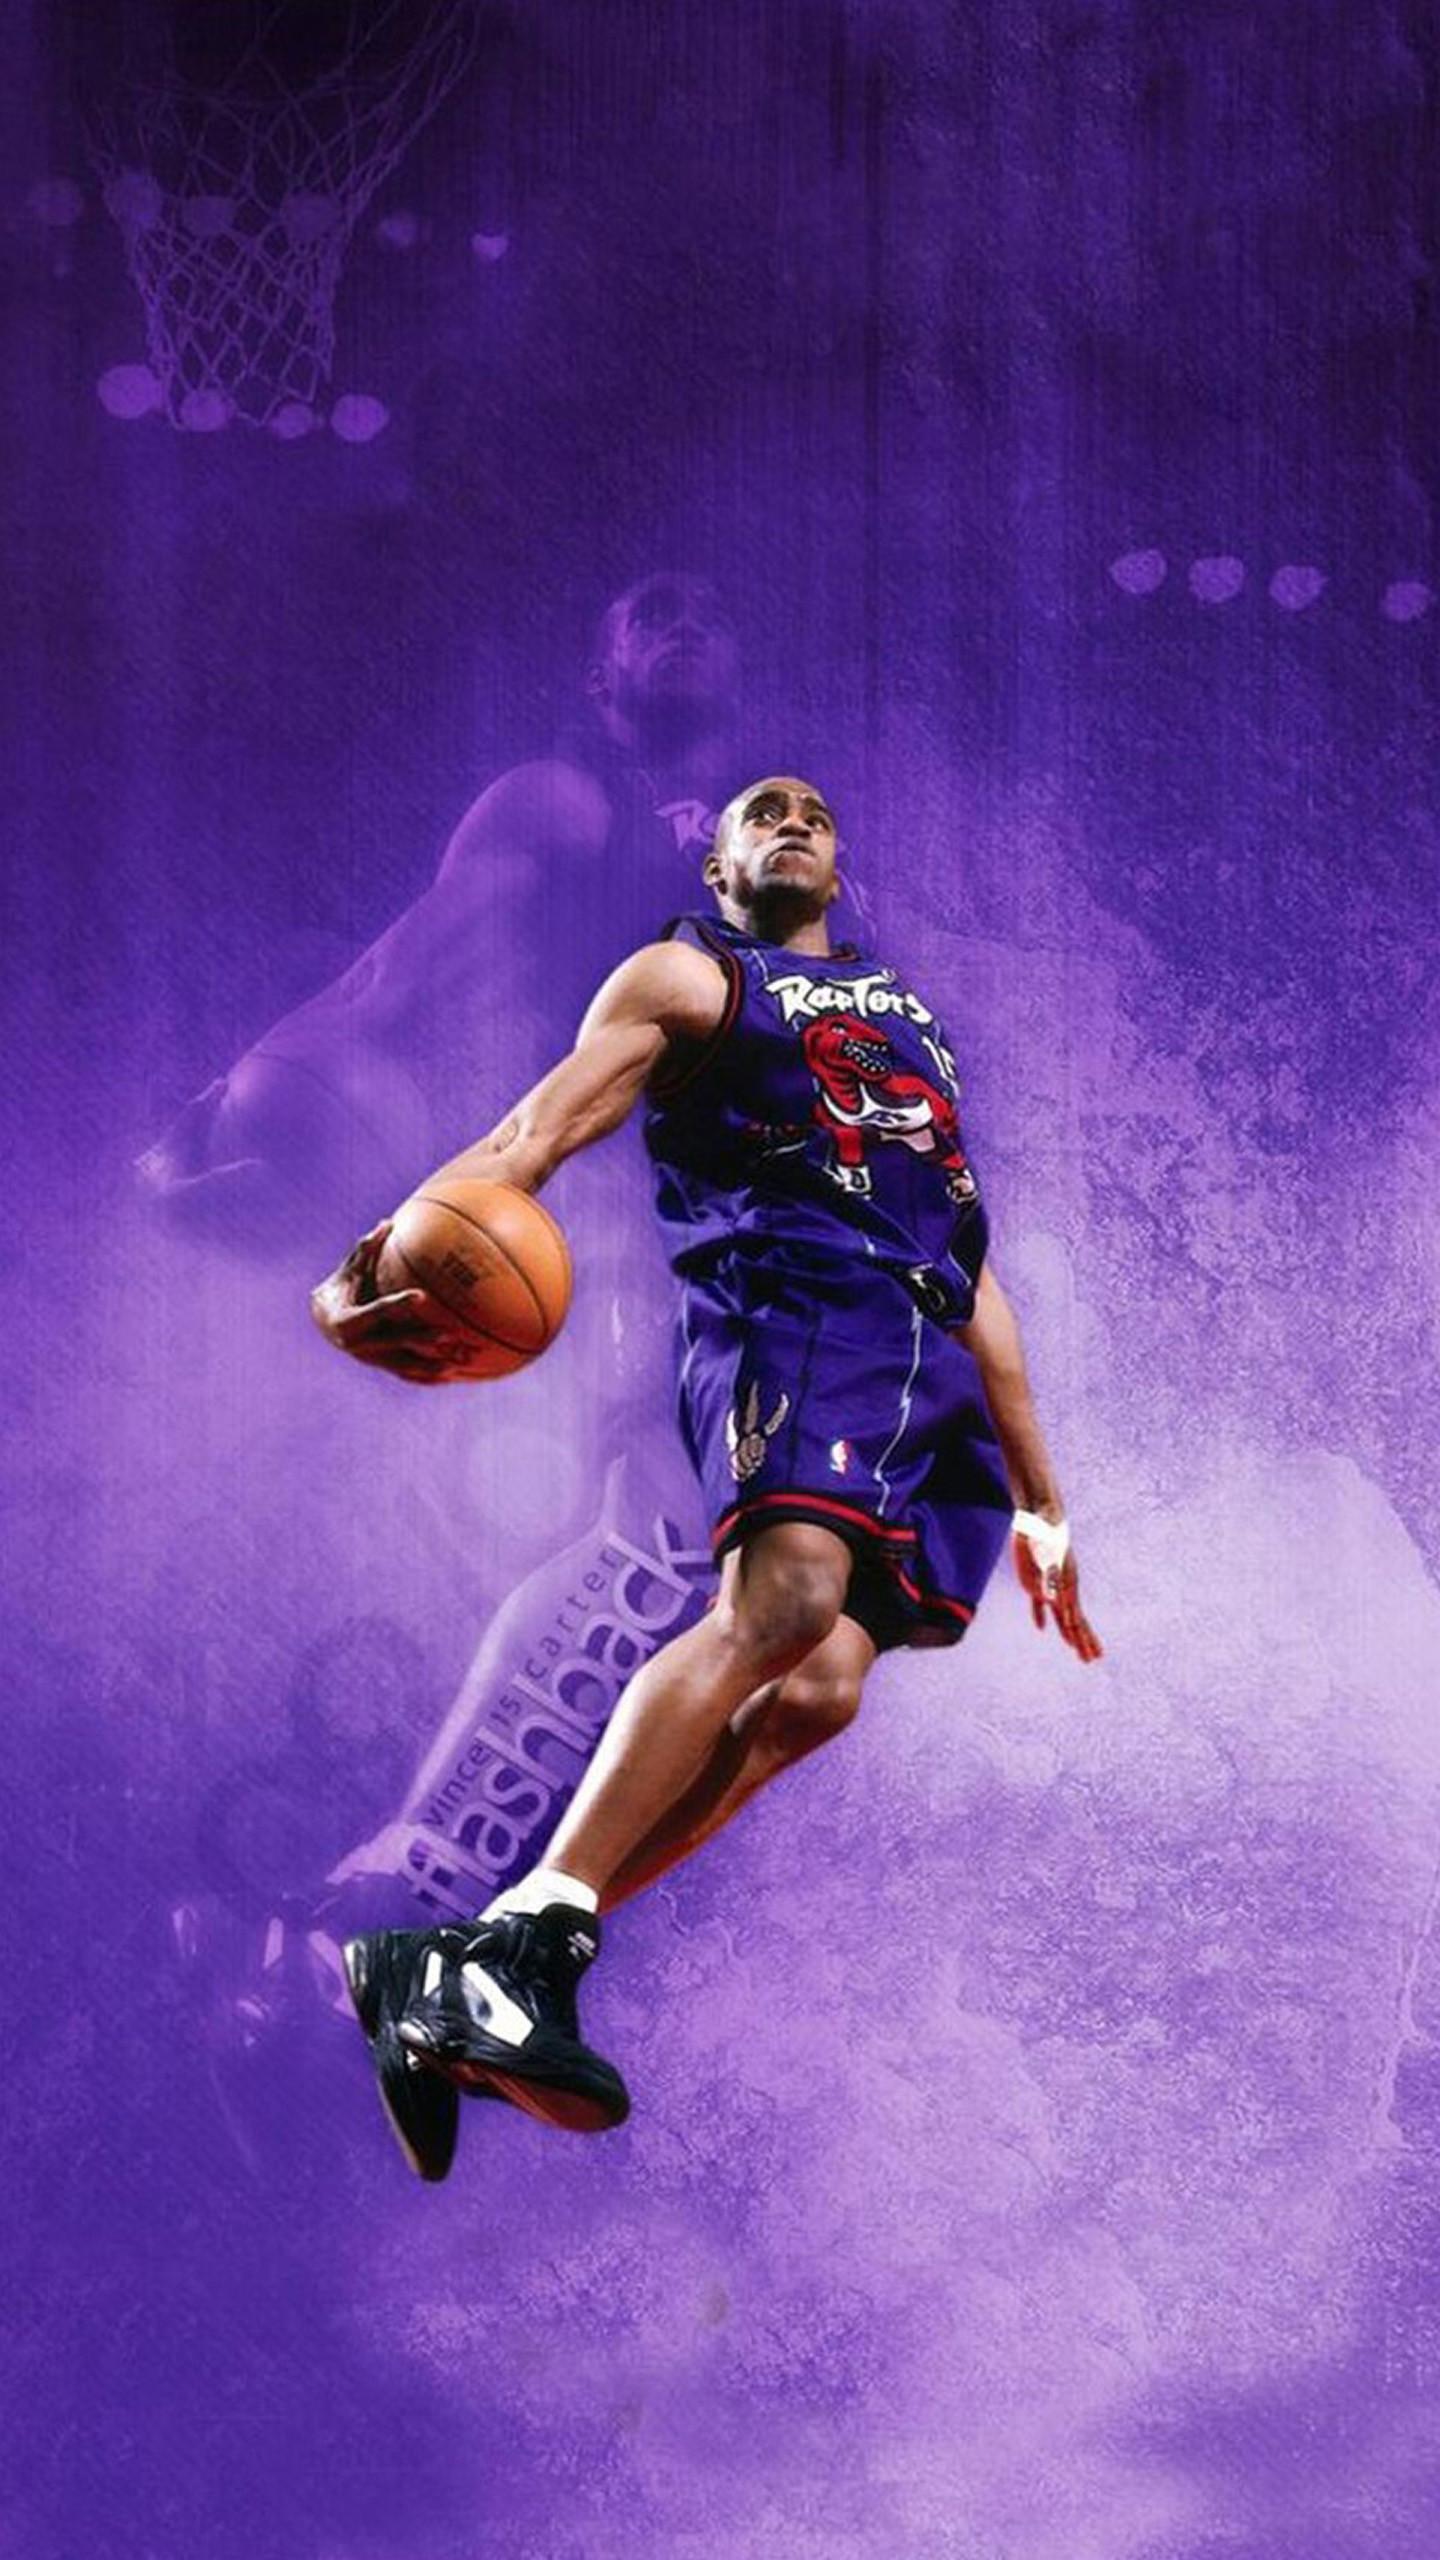 NBA star 03 Galaxy Note 4 Wallpapers